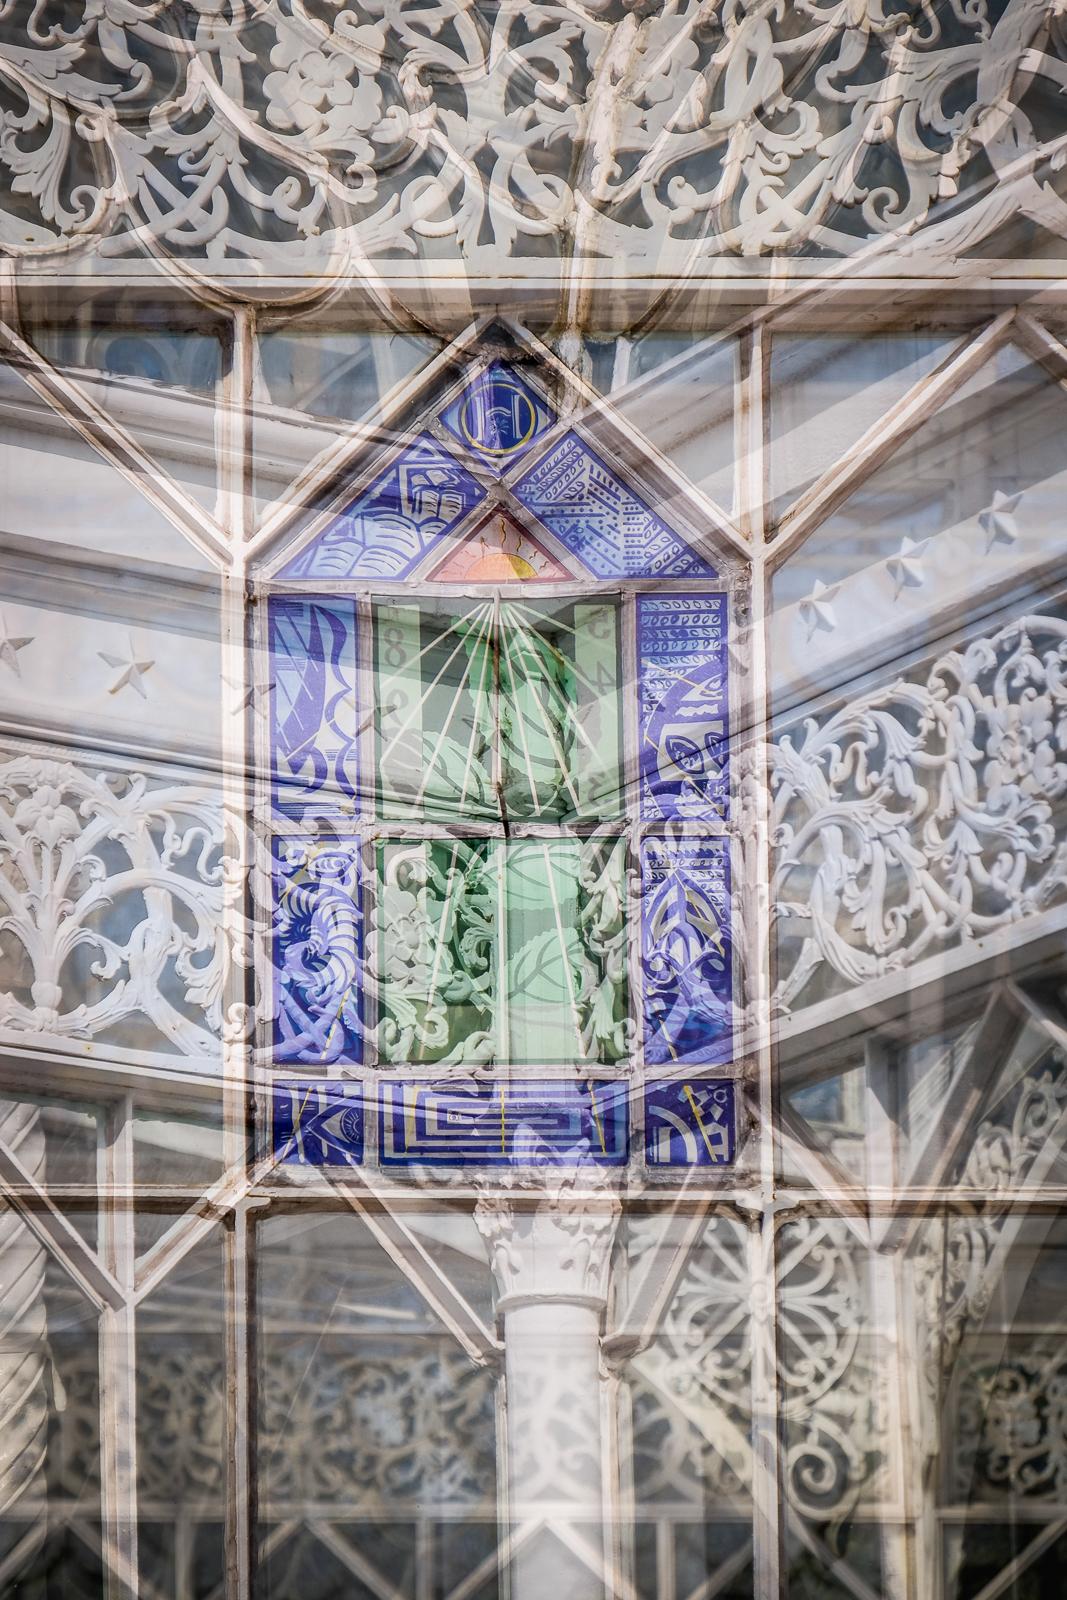 20170327_Lewisham_Horniman-Gardens_Hothouse-double-exposure